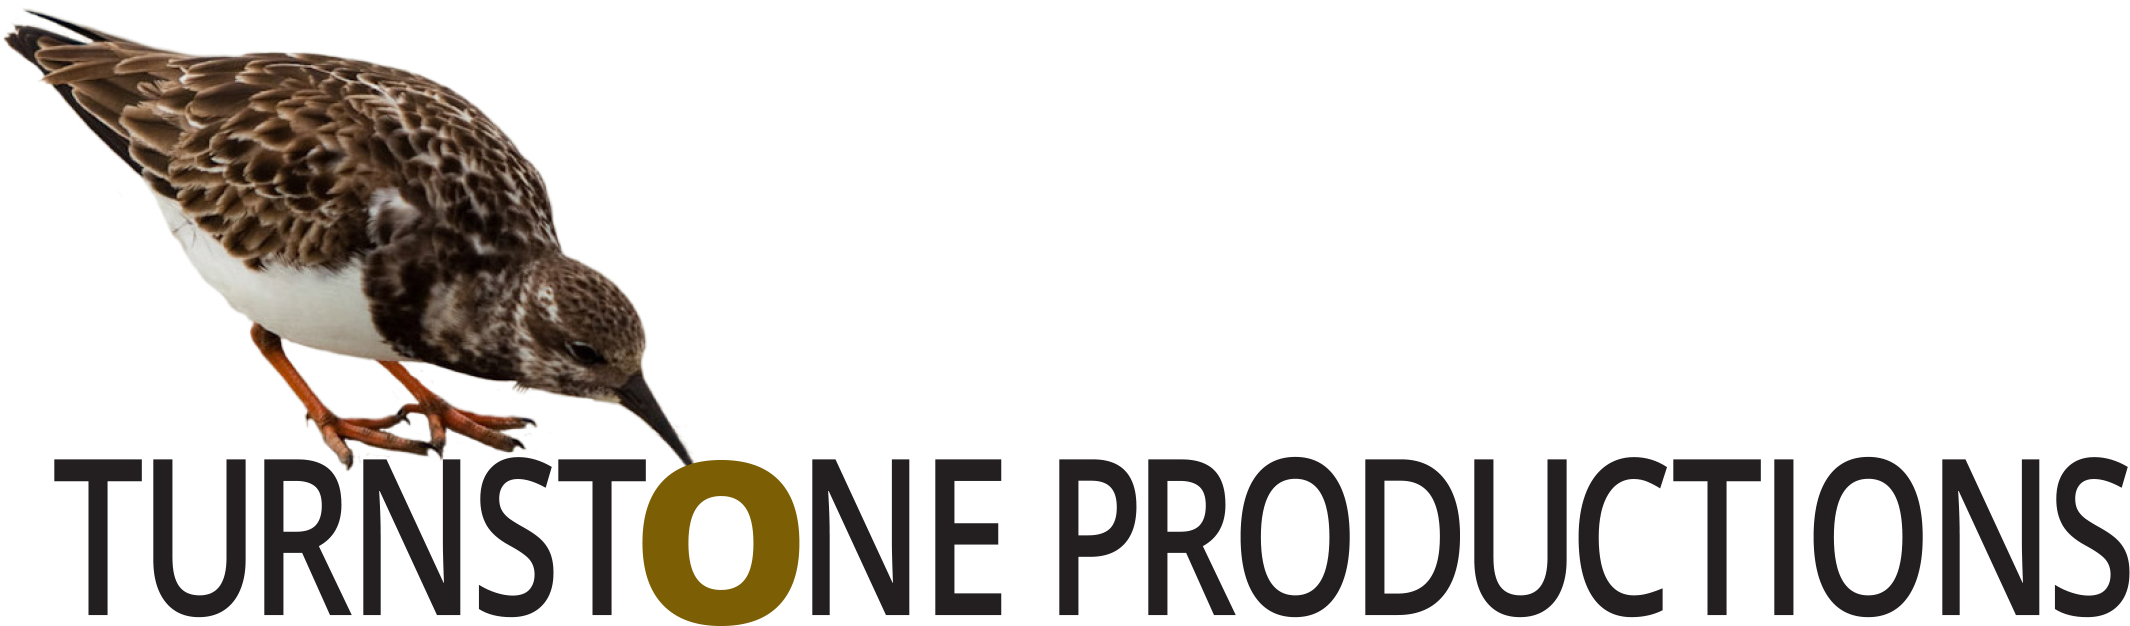 Turnstone Productions